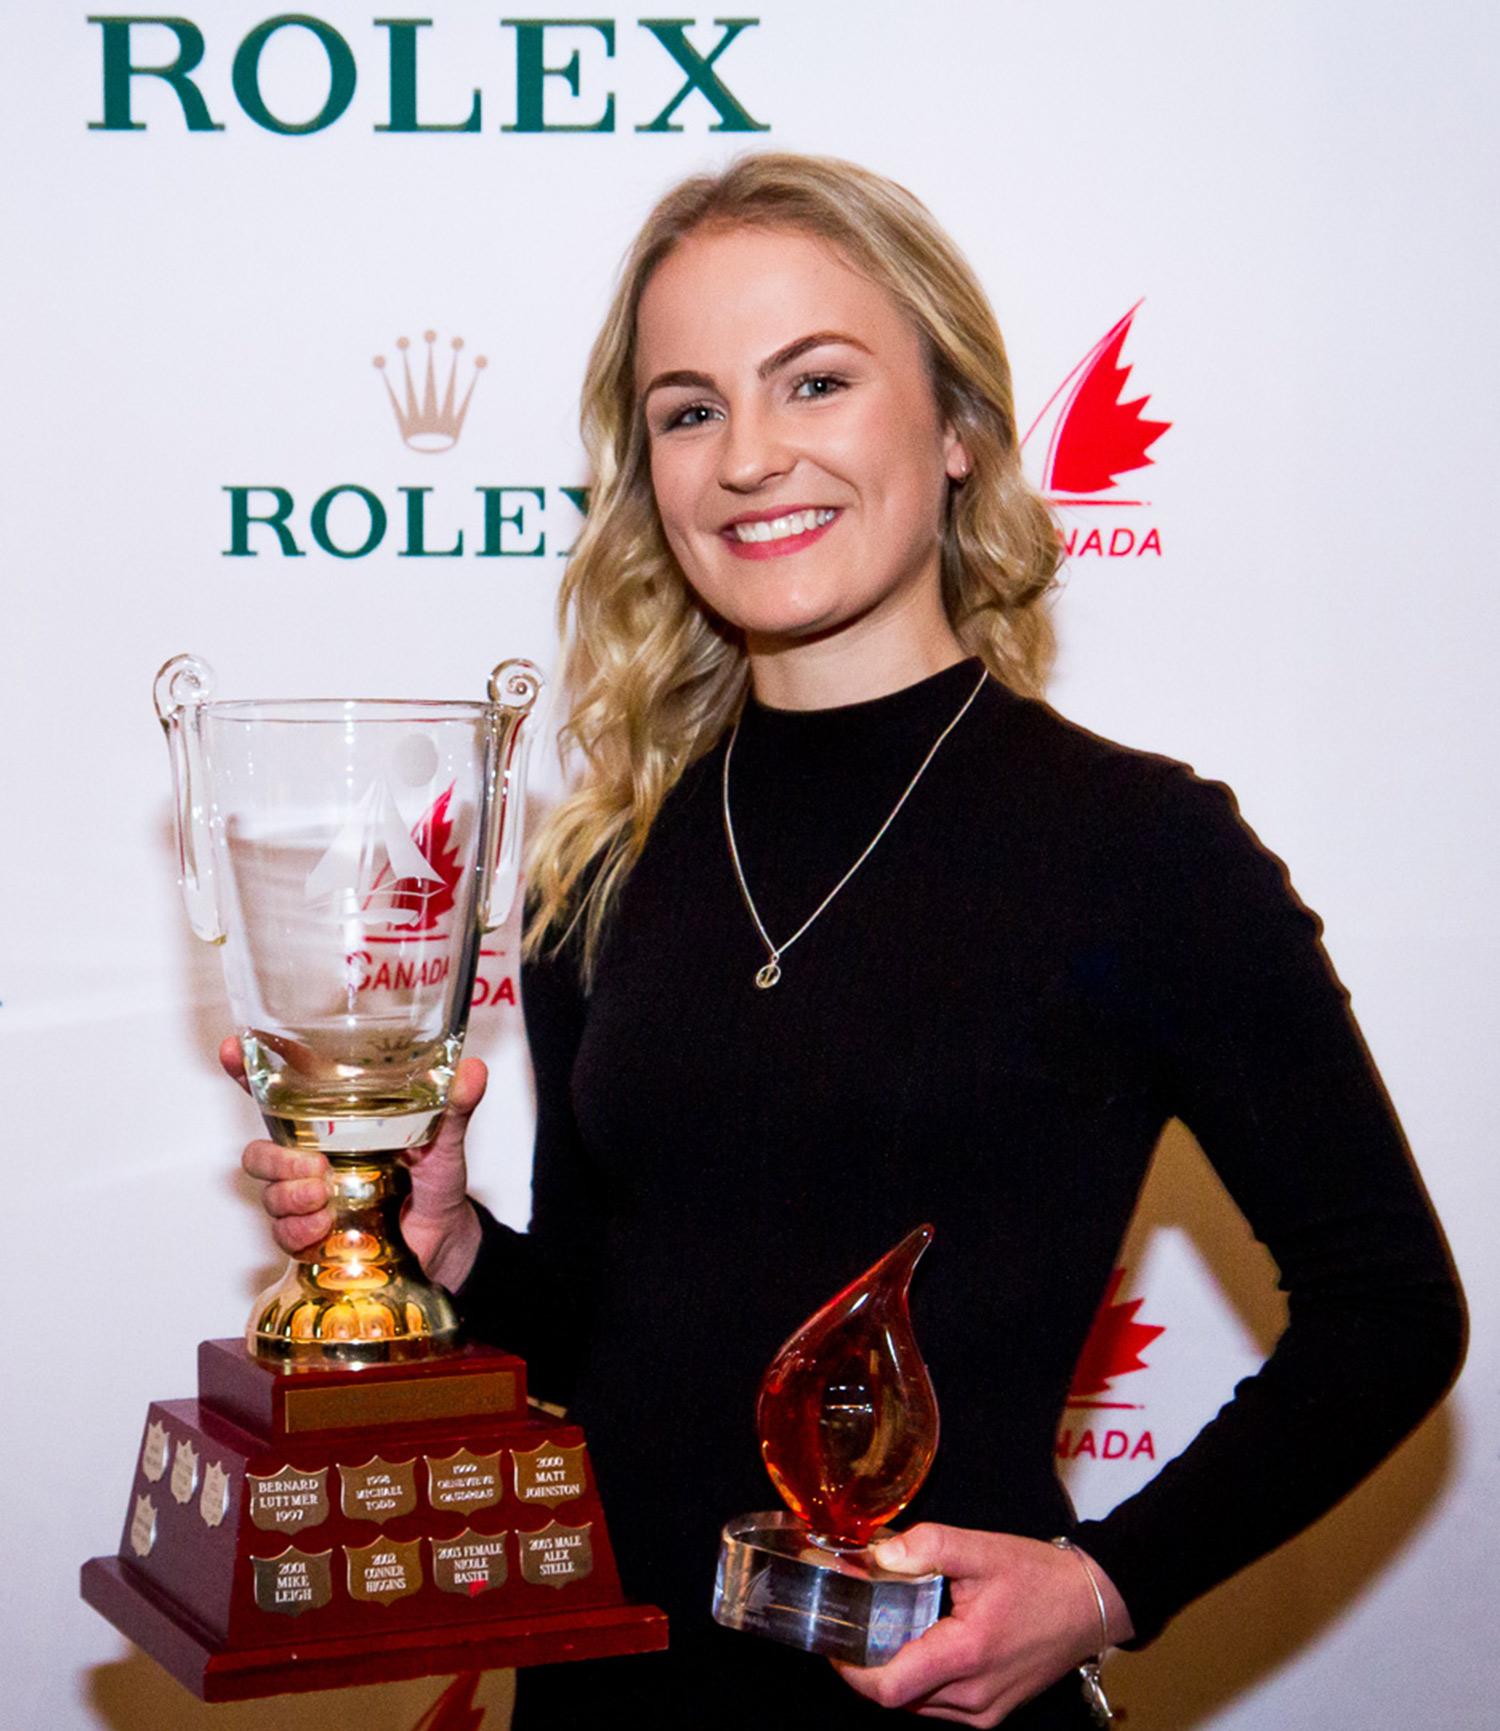 SAIL CANADA – Bill Burk Youth Elite Memorial Award for sailing achievements in 2016 (February 2017)